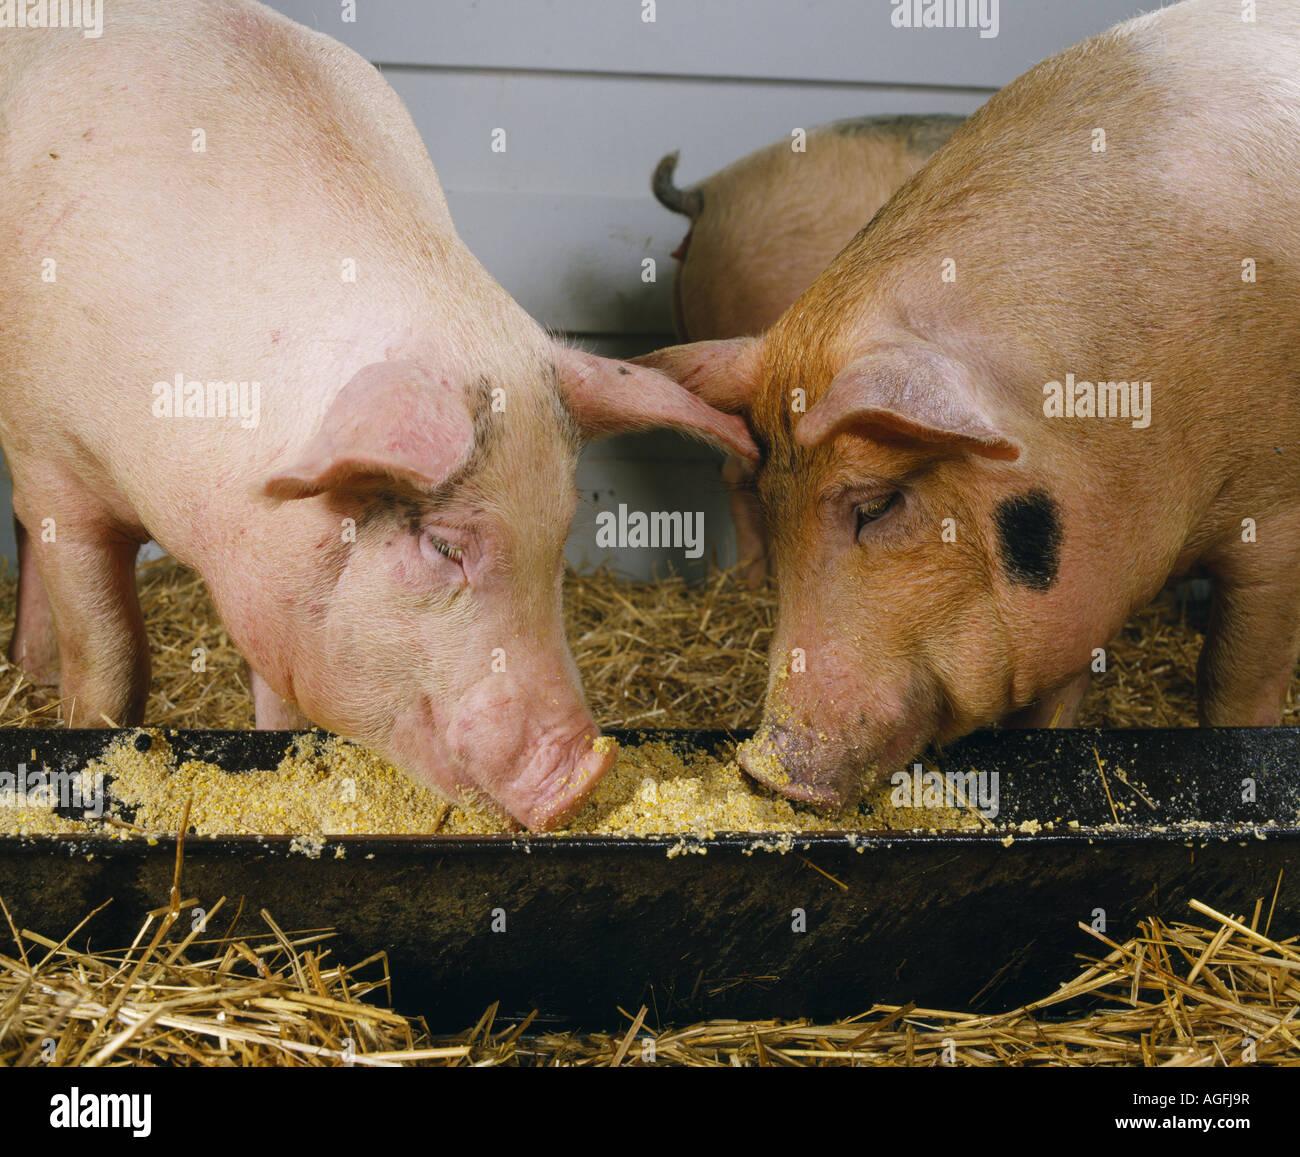 R Hogs Pig Trough Stoc...